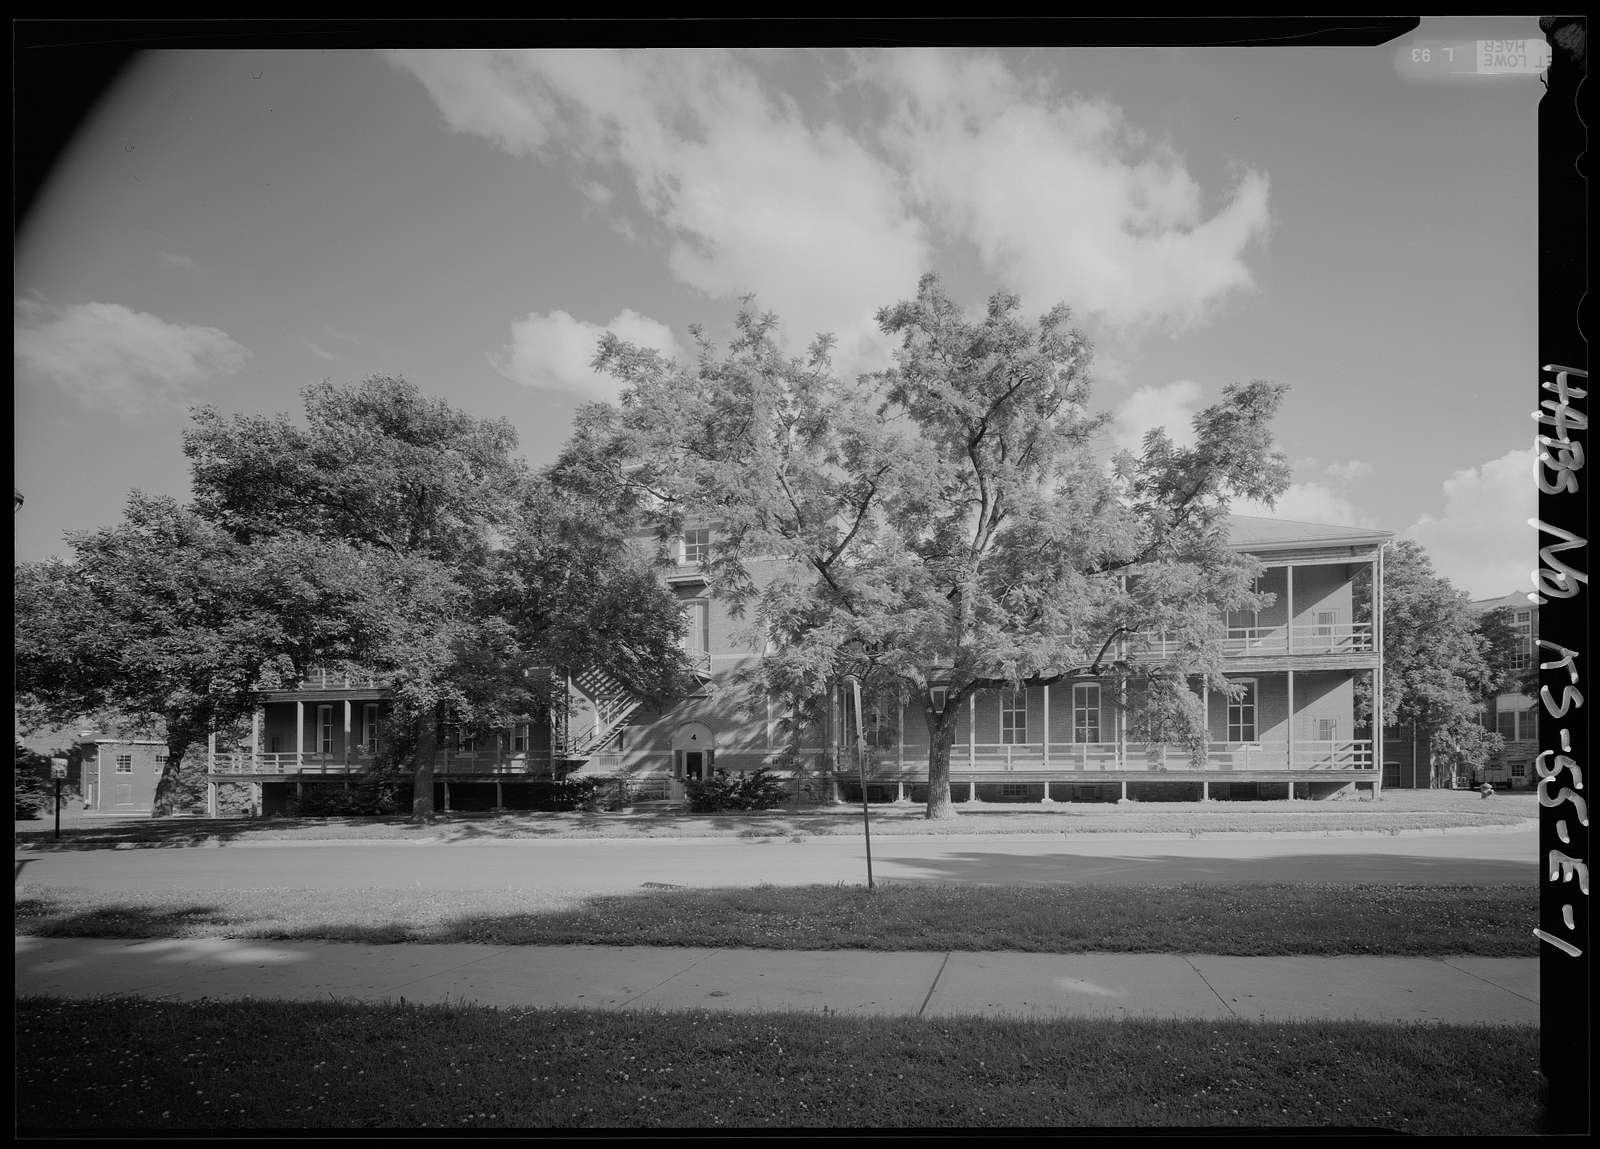 National Home for Disabled Volunteer Soldiers, Western Branch, Barracks, Franklin Avenue, Leavenworth, Leavenworth County, KS